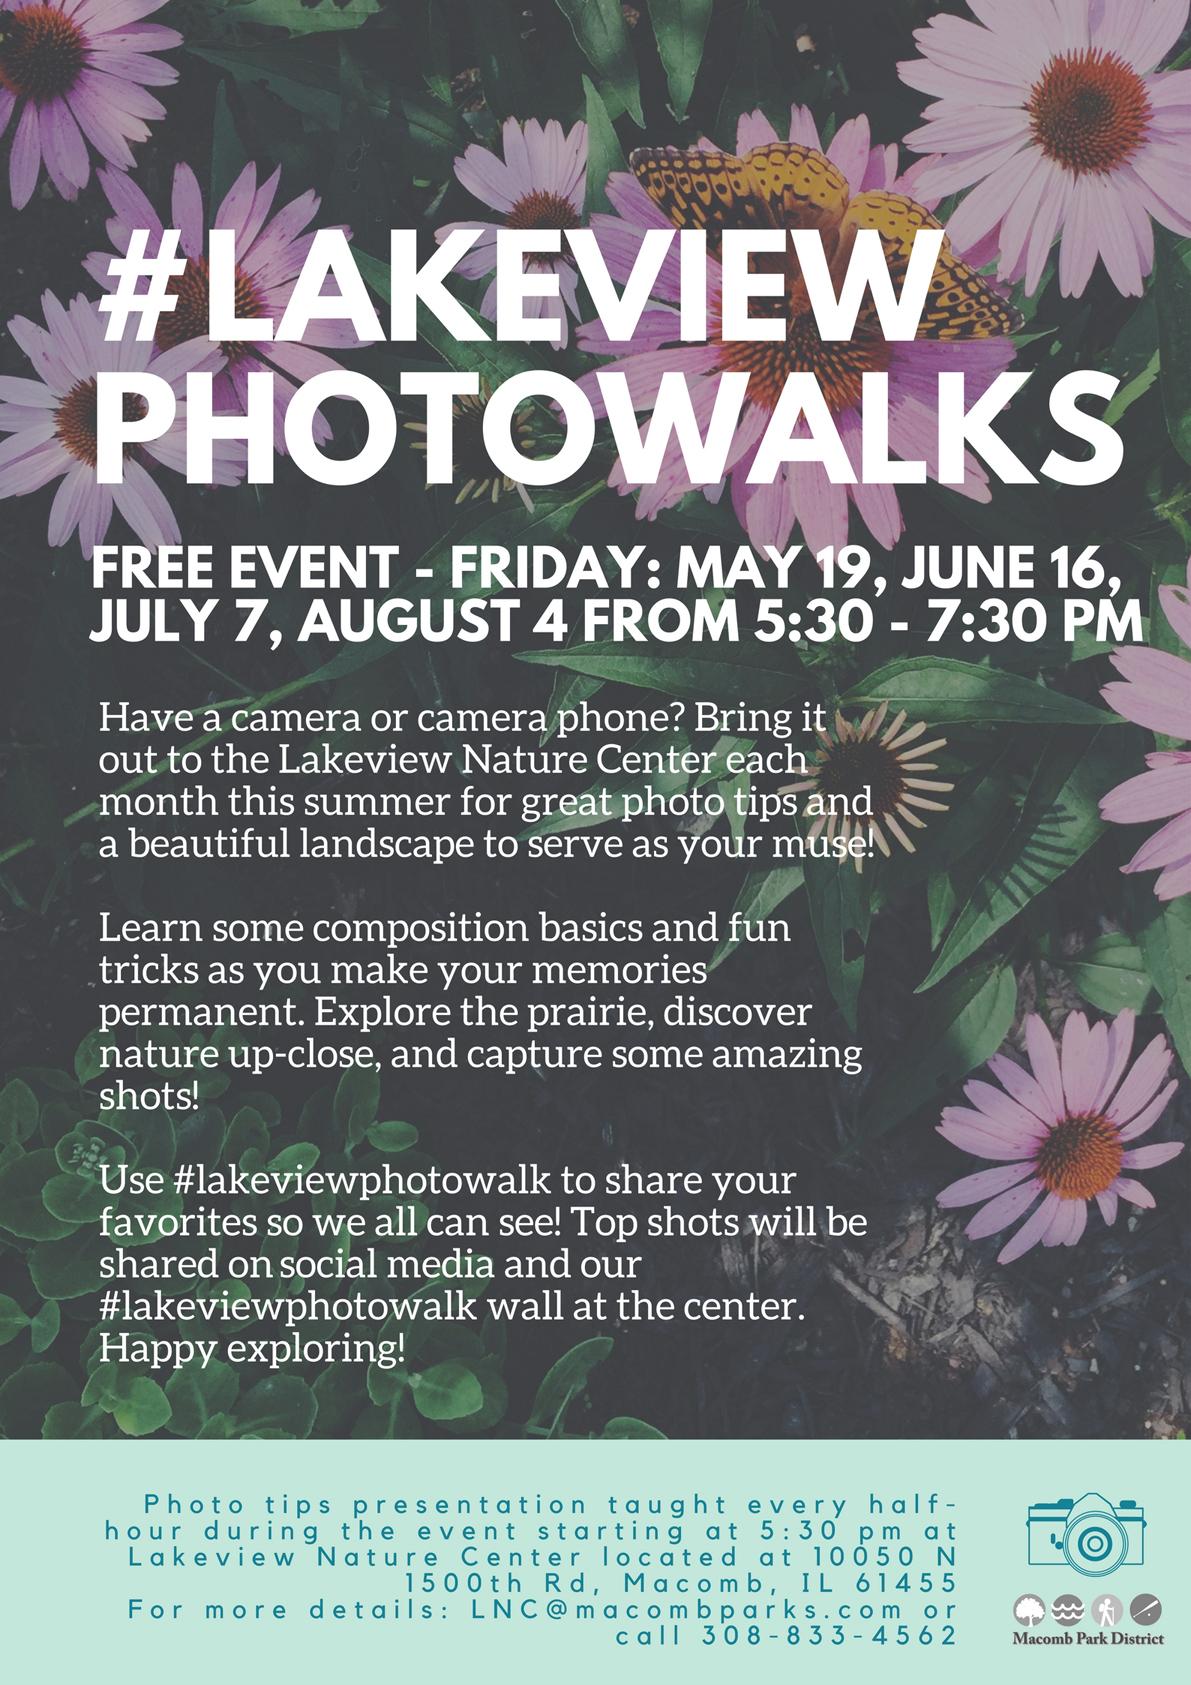 lakeviewphotowalks